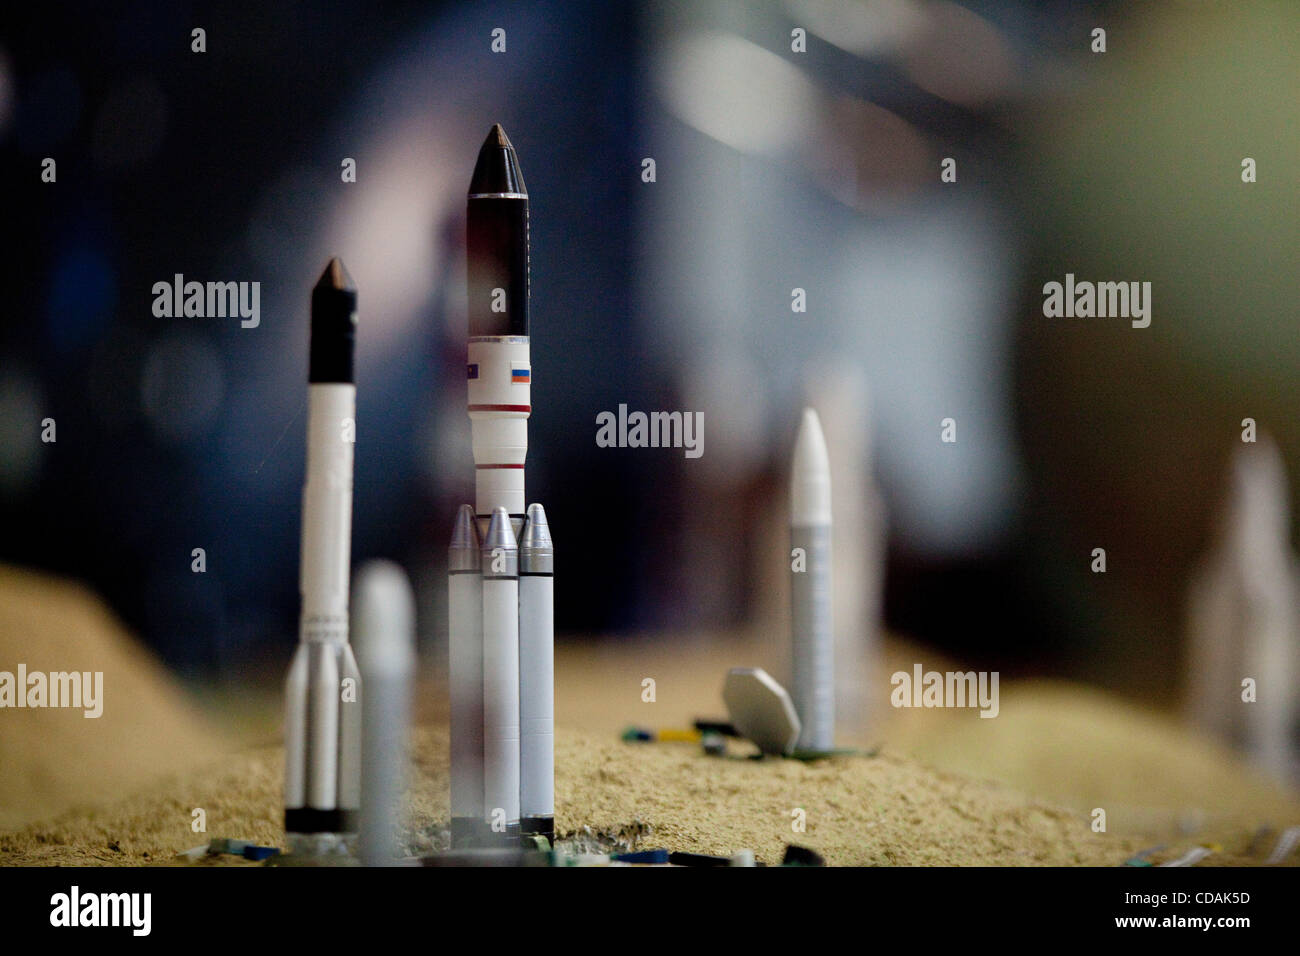 Sep 03, 2010 - Baikonur, Kazakhstan - Baikonur cosmodrome model of Soyuz rocket on launch pads, Museum of Baikonur - Stock Image